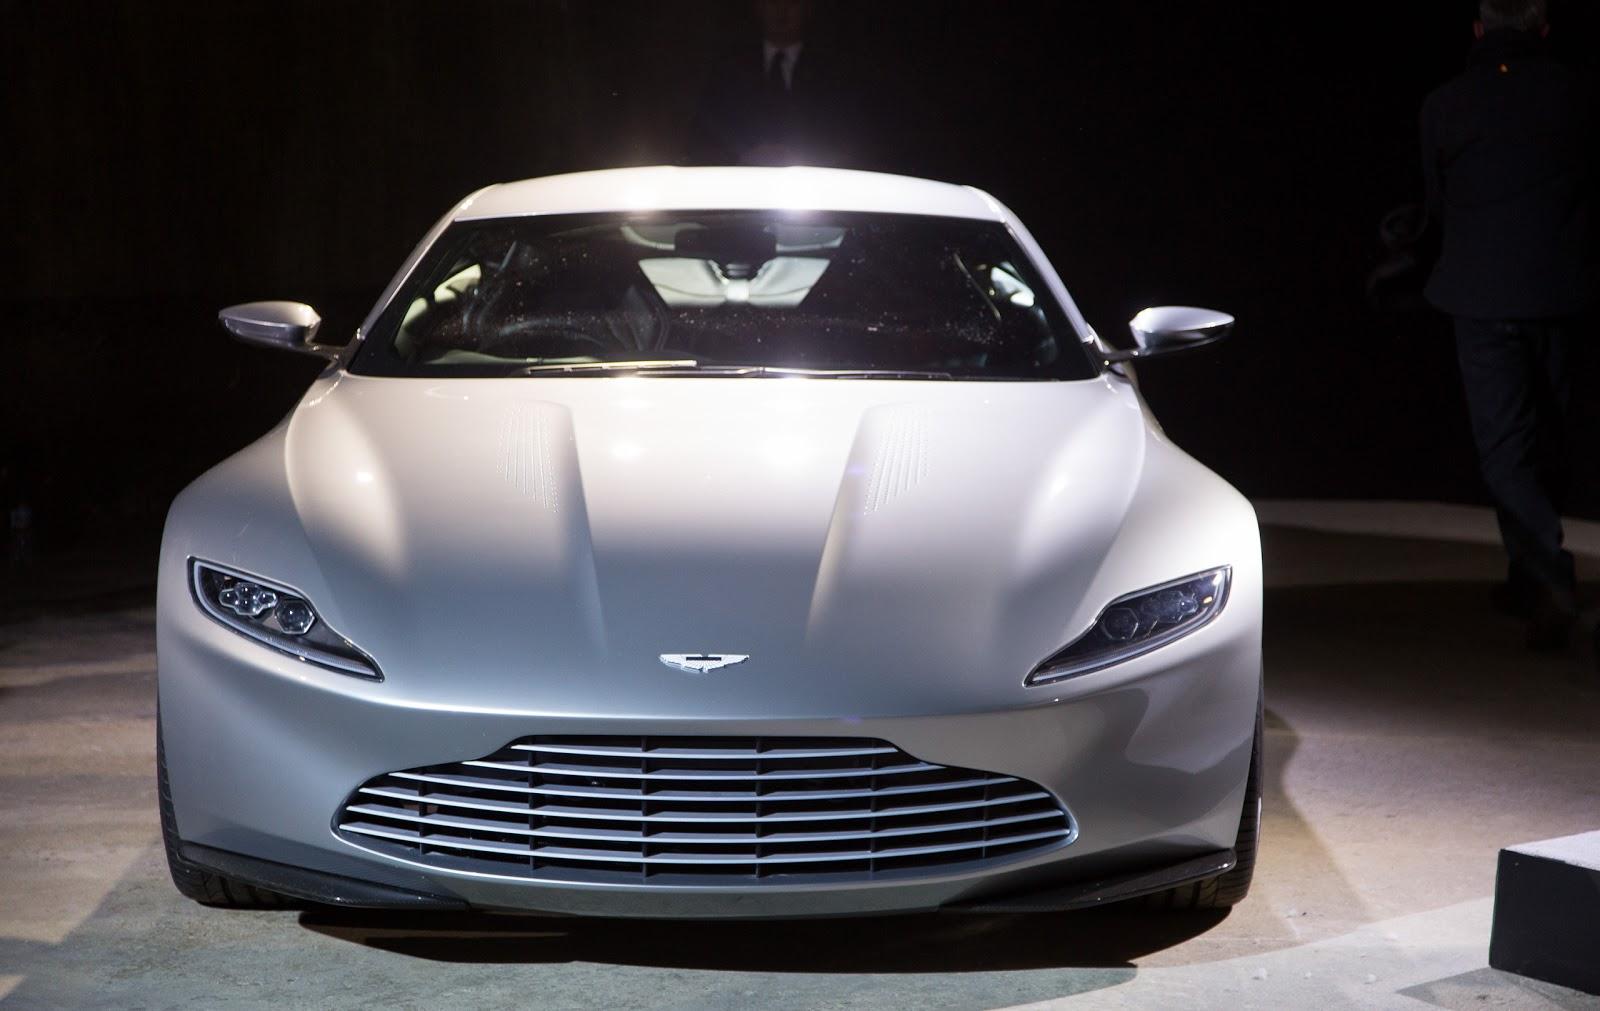 SPECTRE Aston Martin DB 10